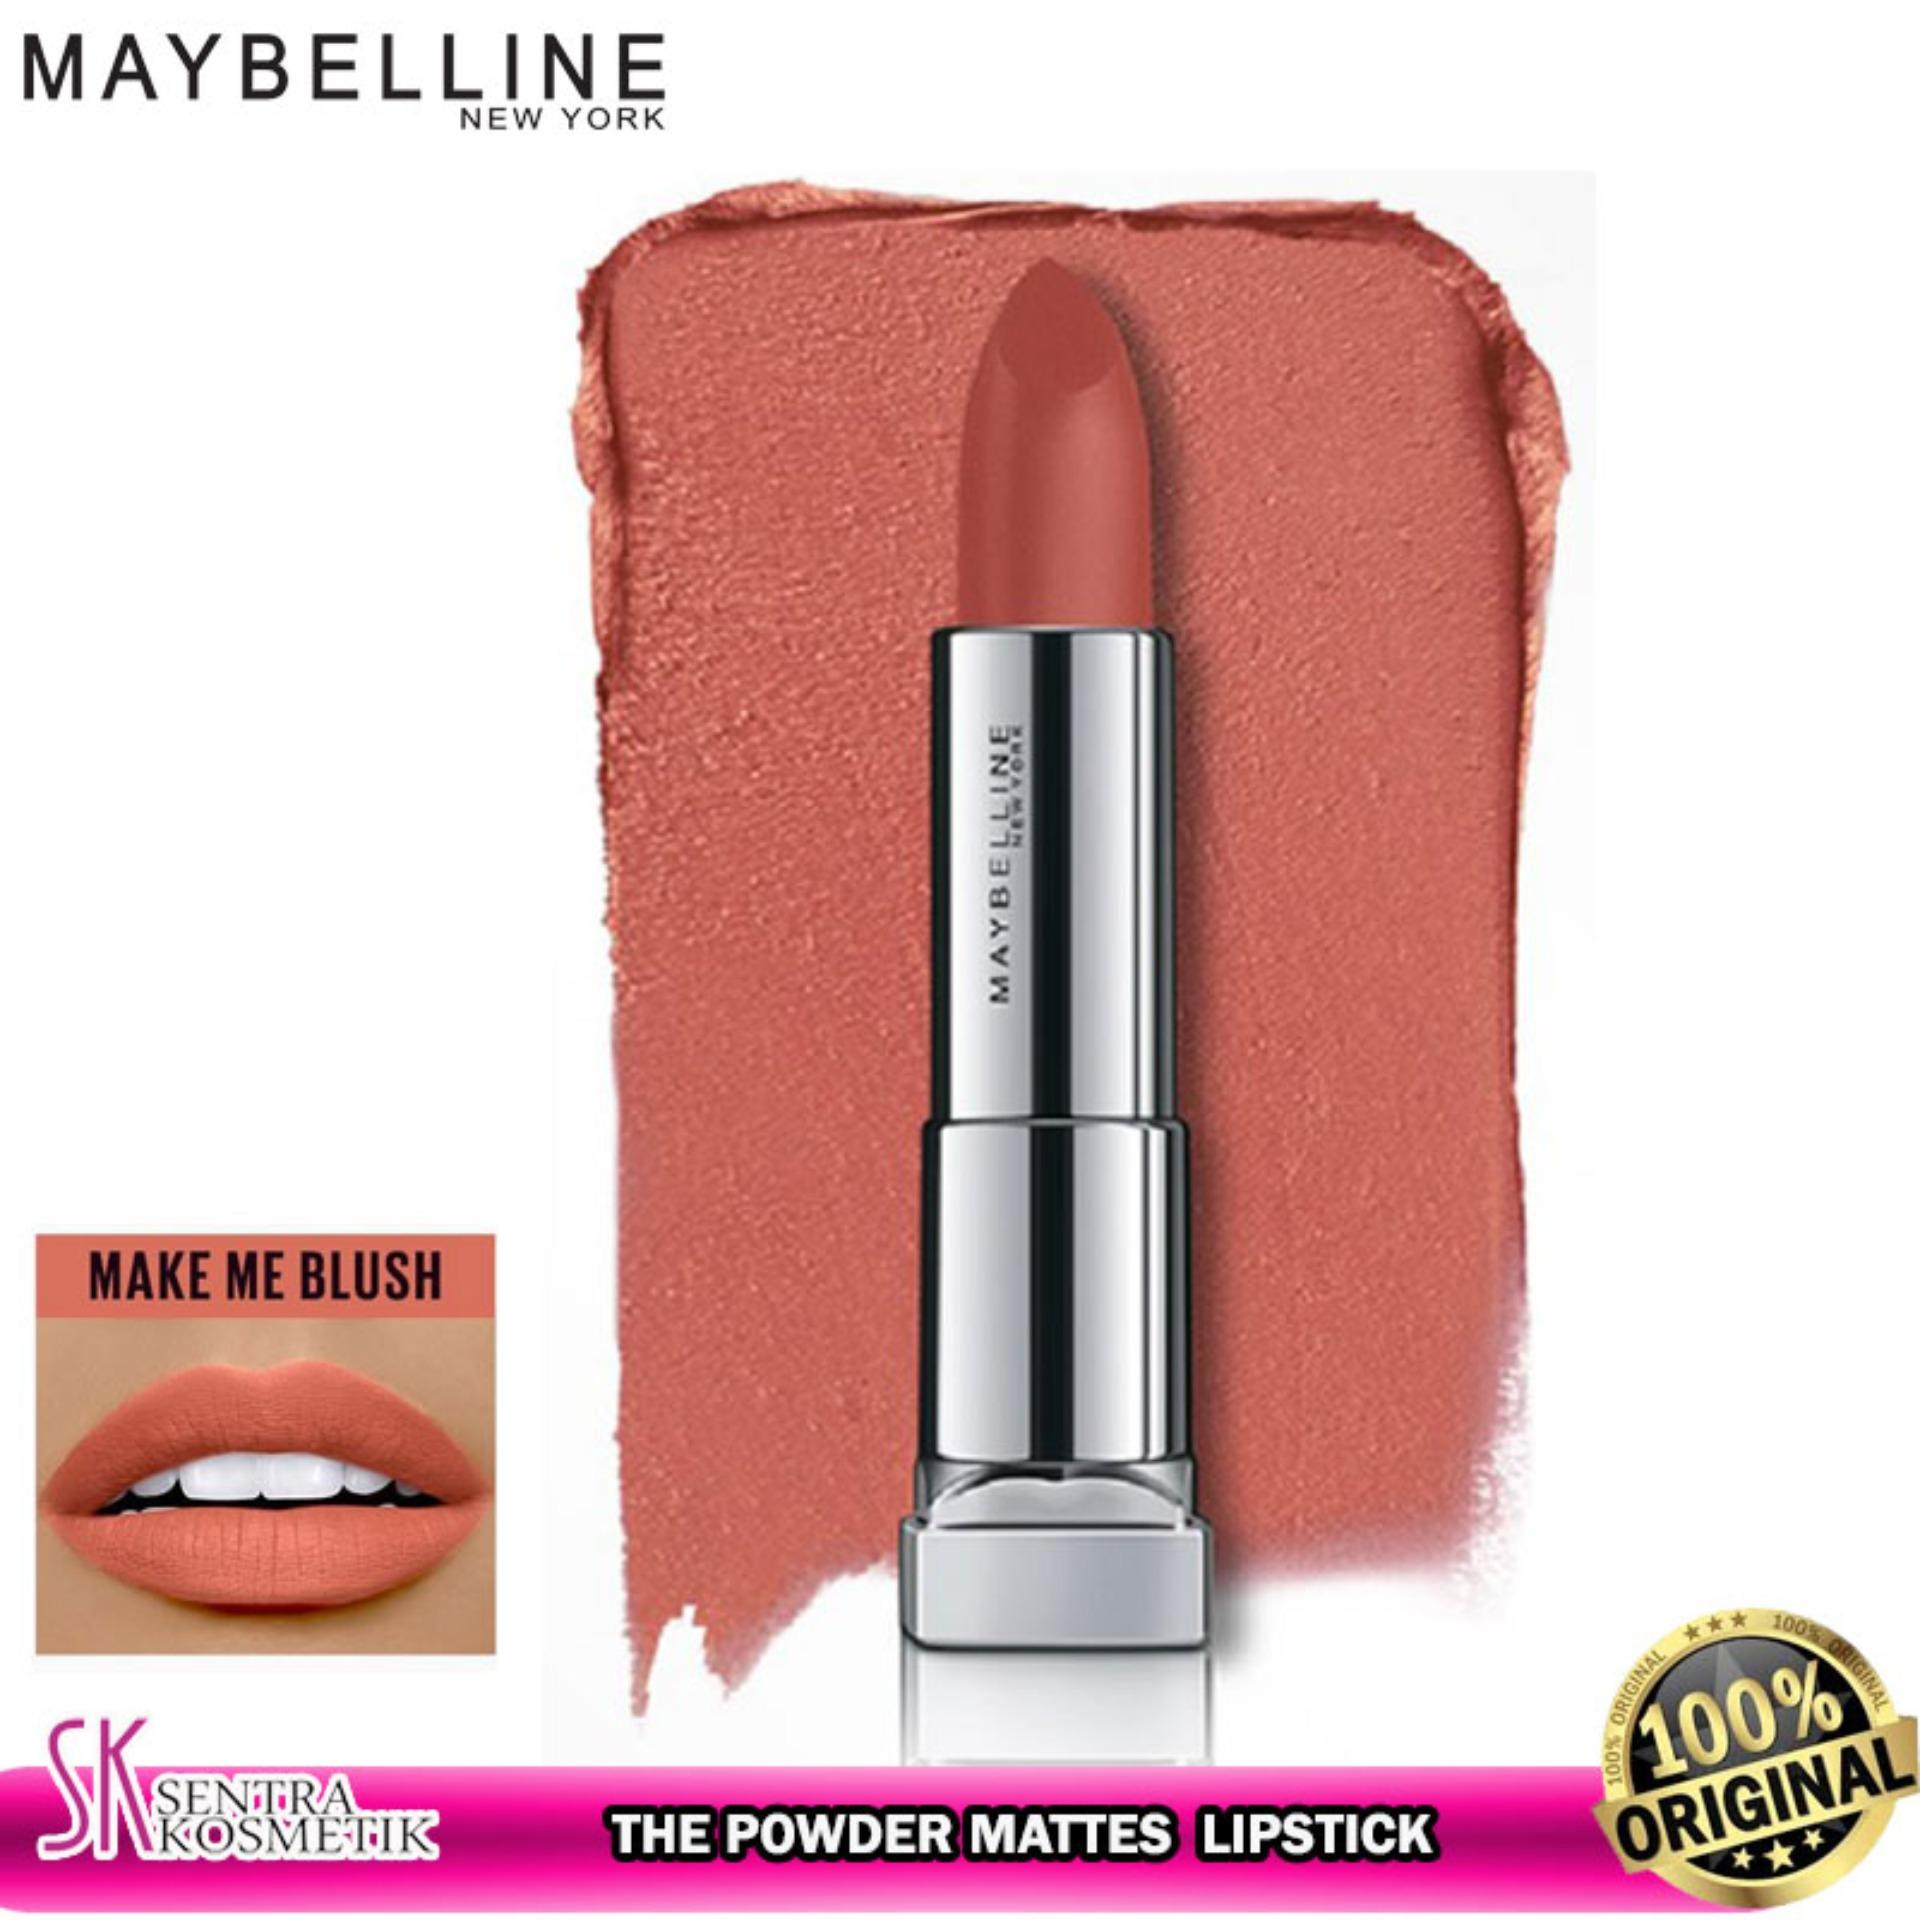 MAYBELLINE Color Sensational The Powder Mattes Lipstick - MAKE ME BLUSH